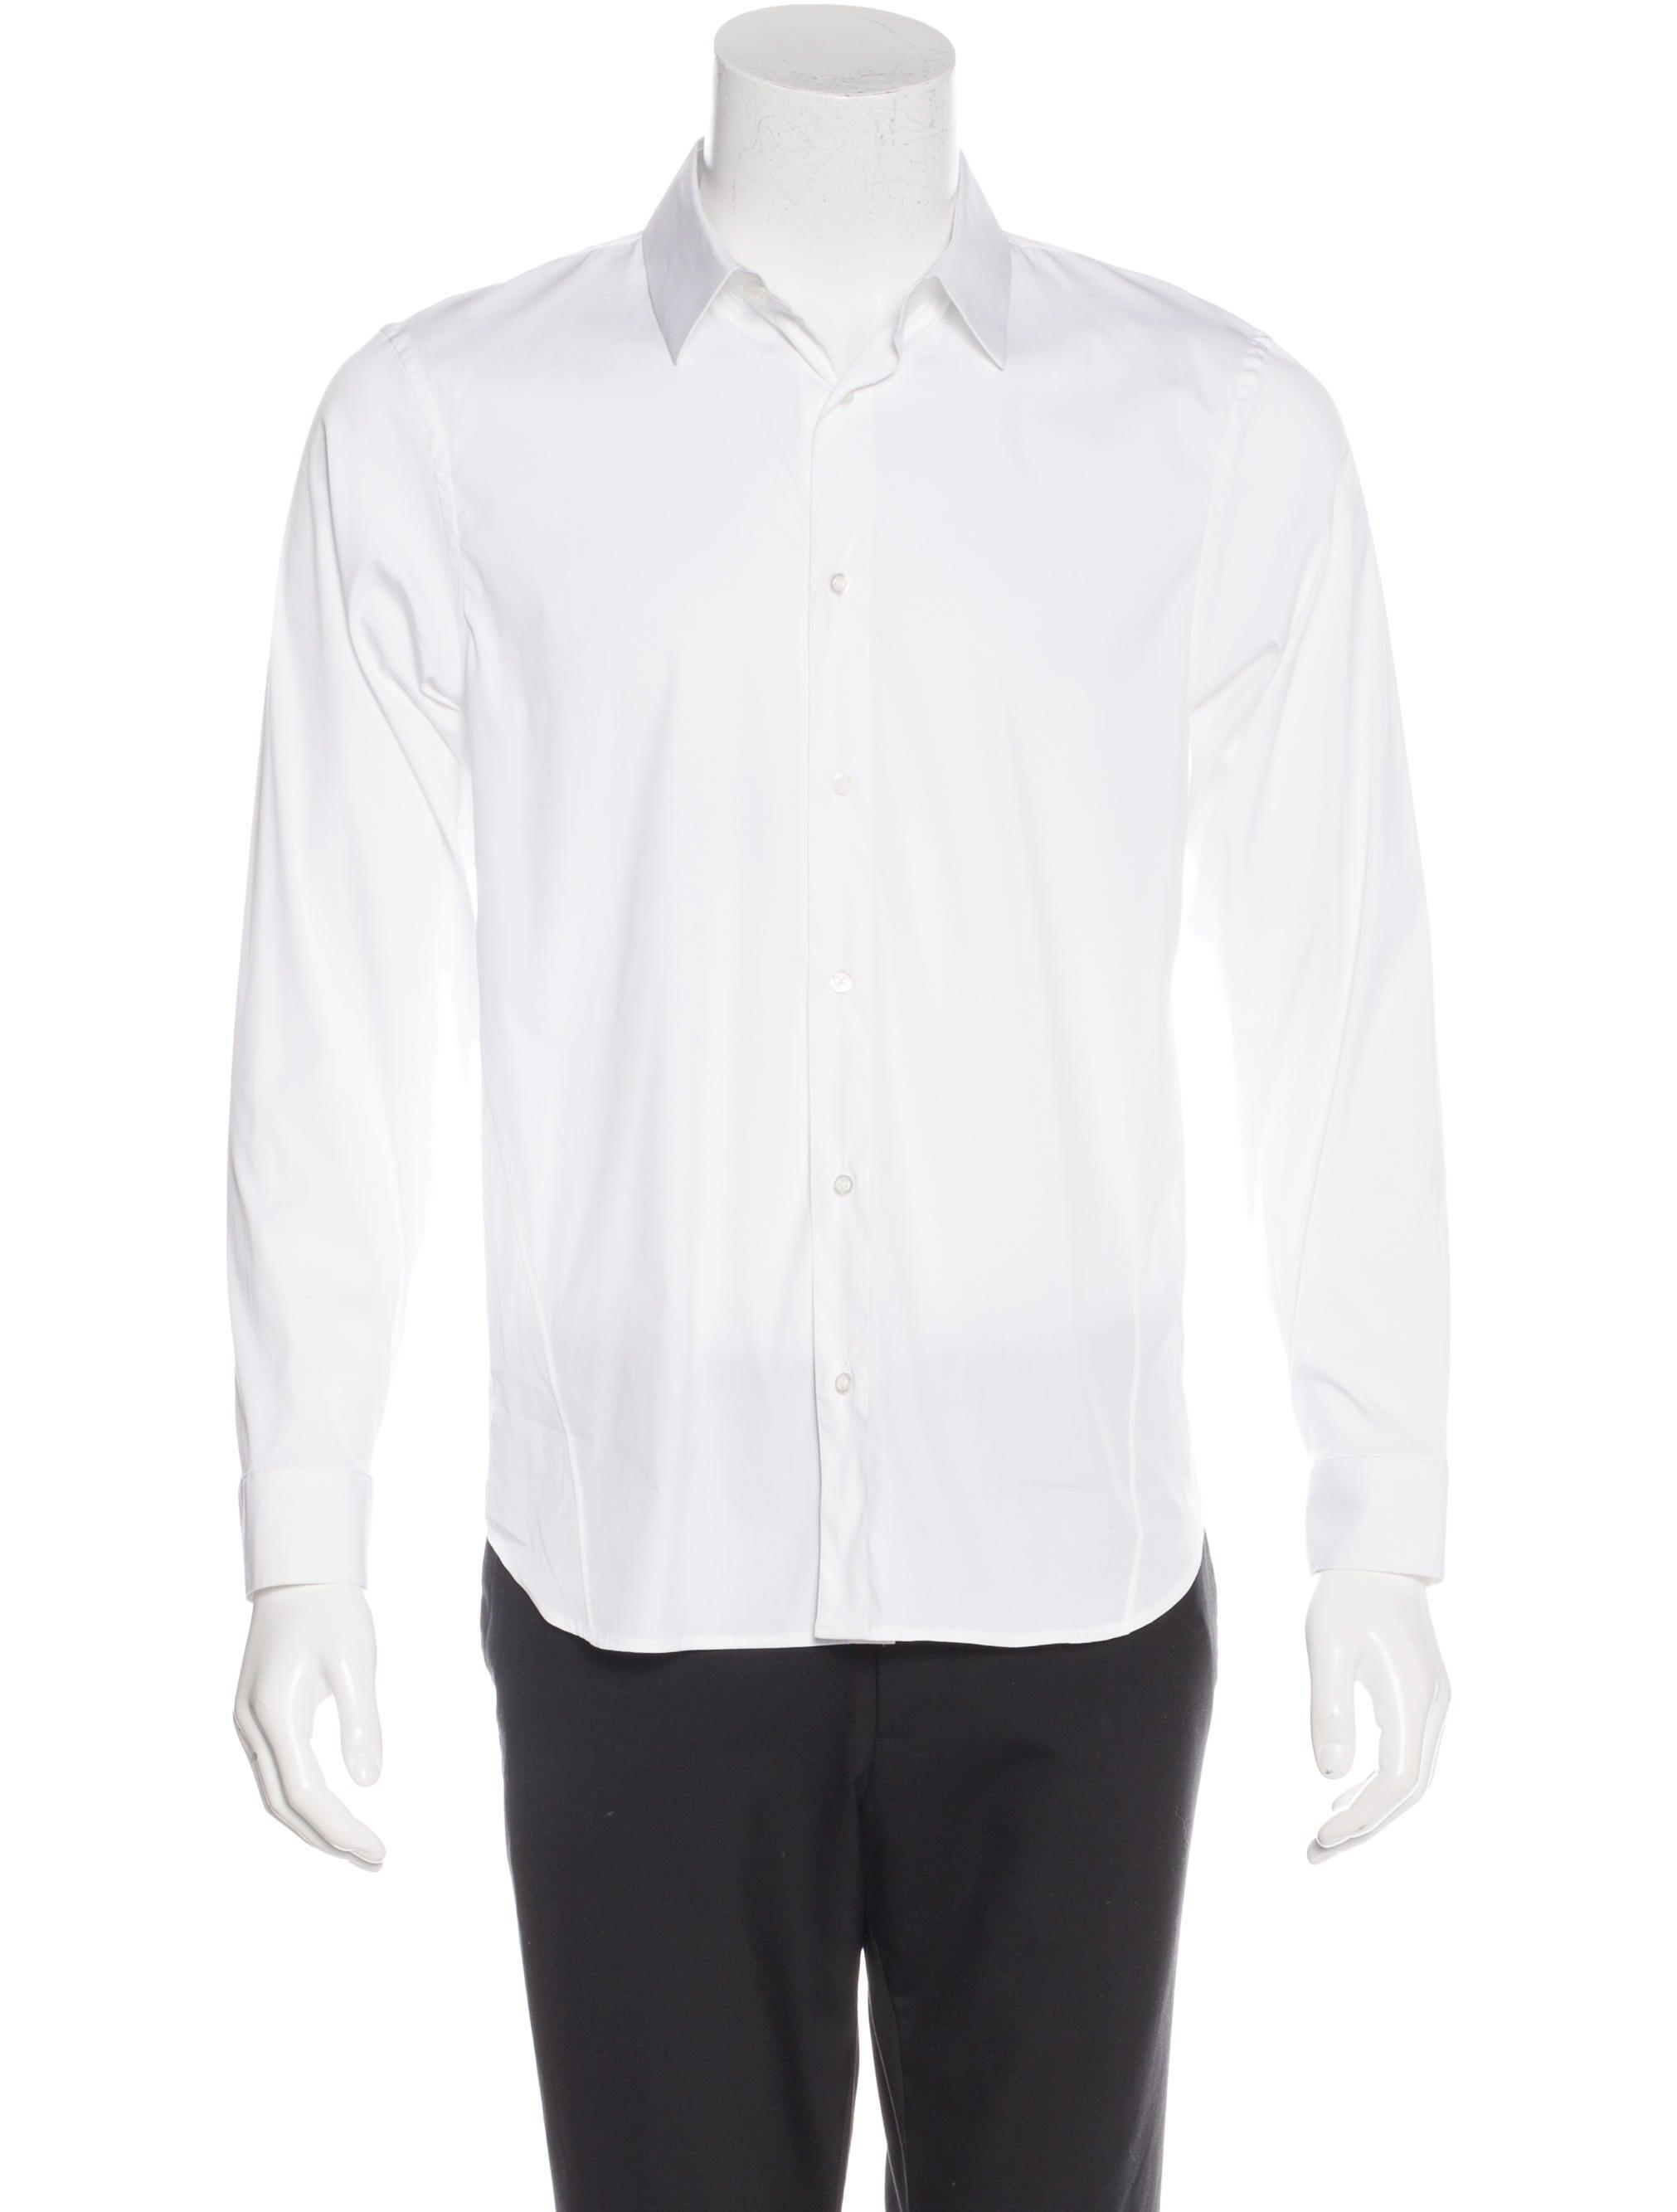 Jil sander woven dress shirt mens shirts jil35557 for Jil sander mens shirt